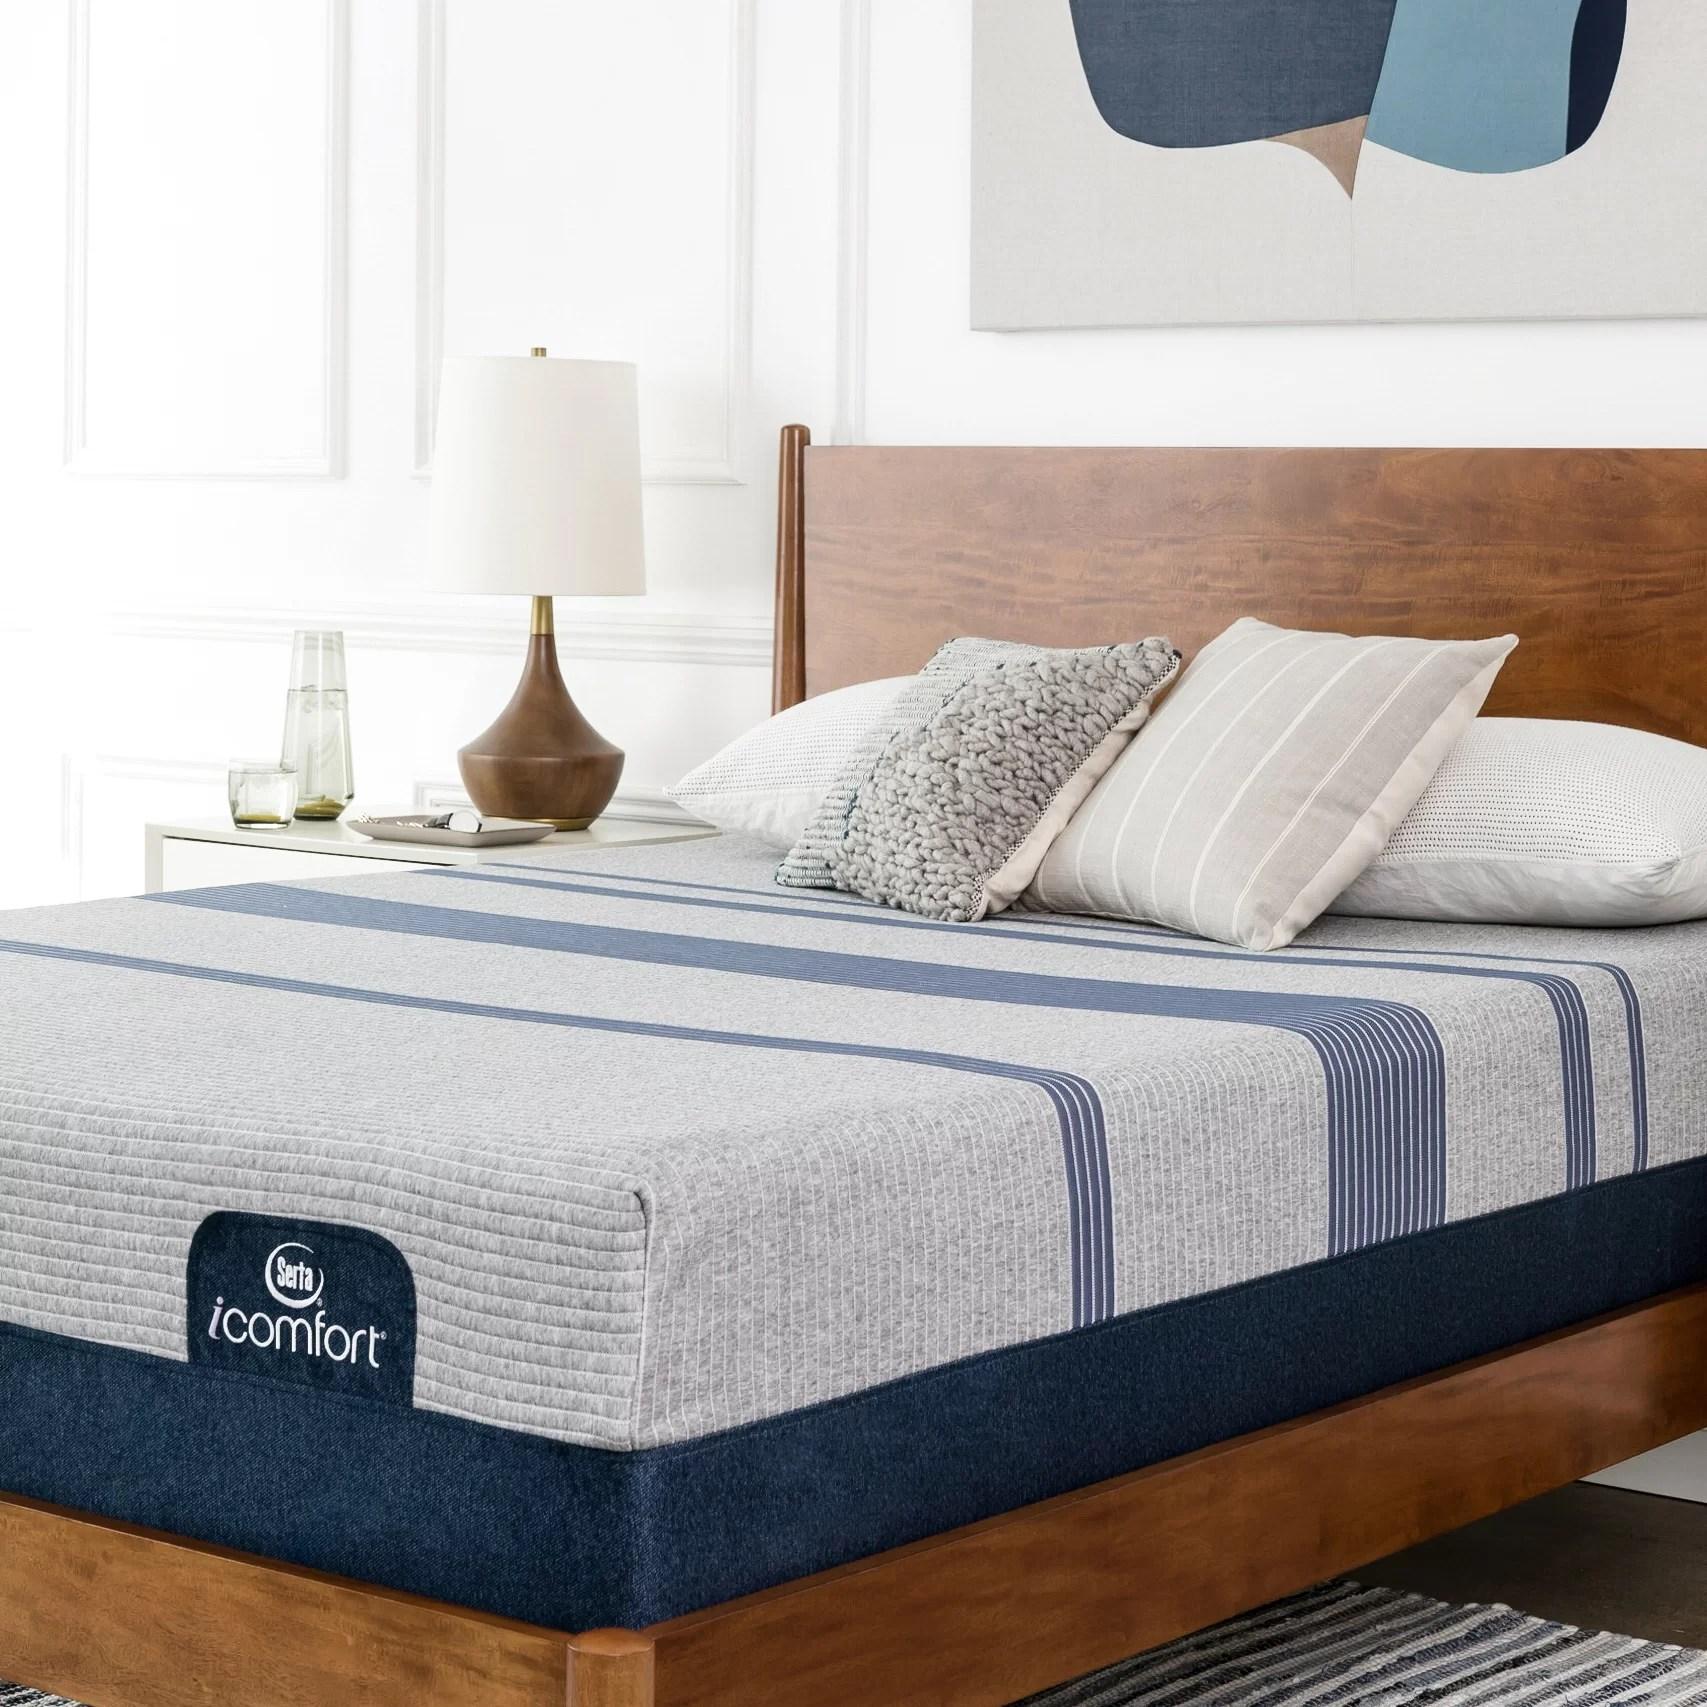 http www lat34north com fox aspx cid 852 shop serta cooling gel memory foam classic pillow xi 3 xc 25 pr 29 99